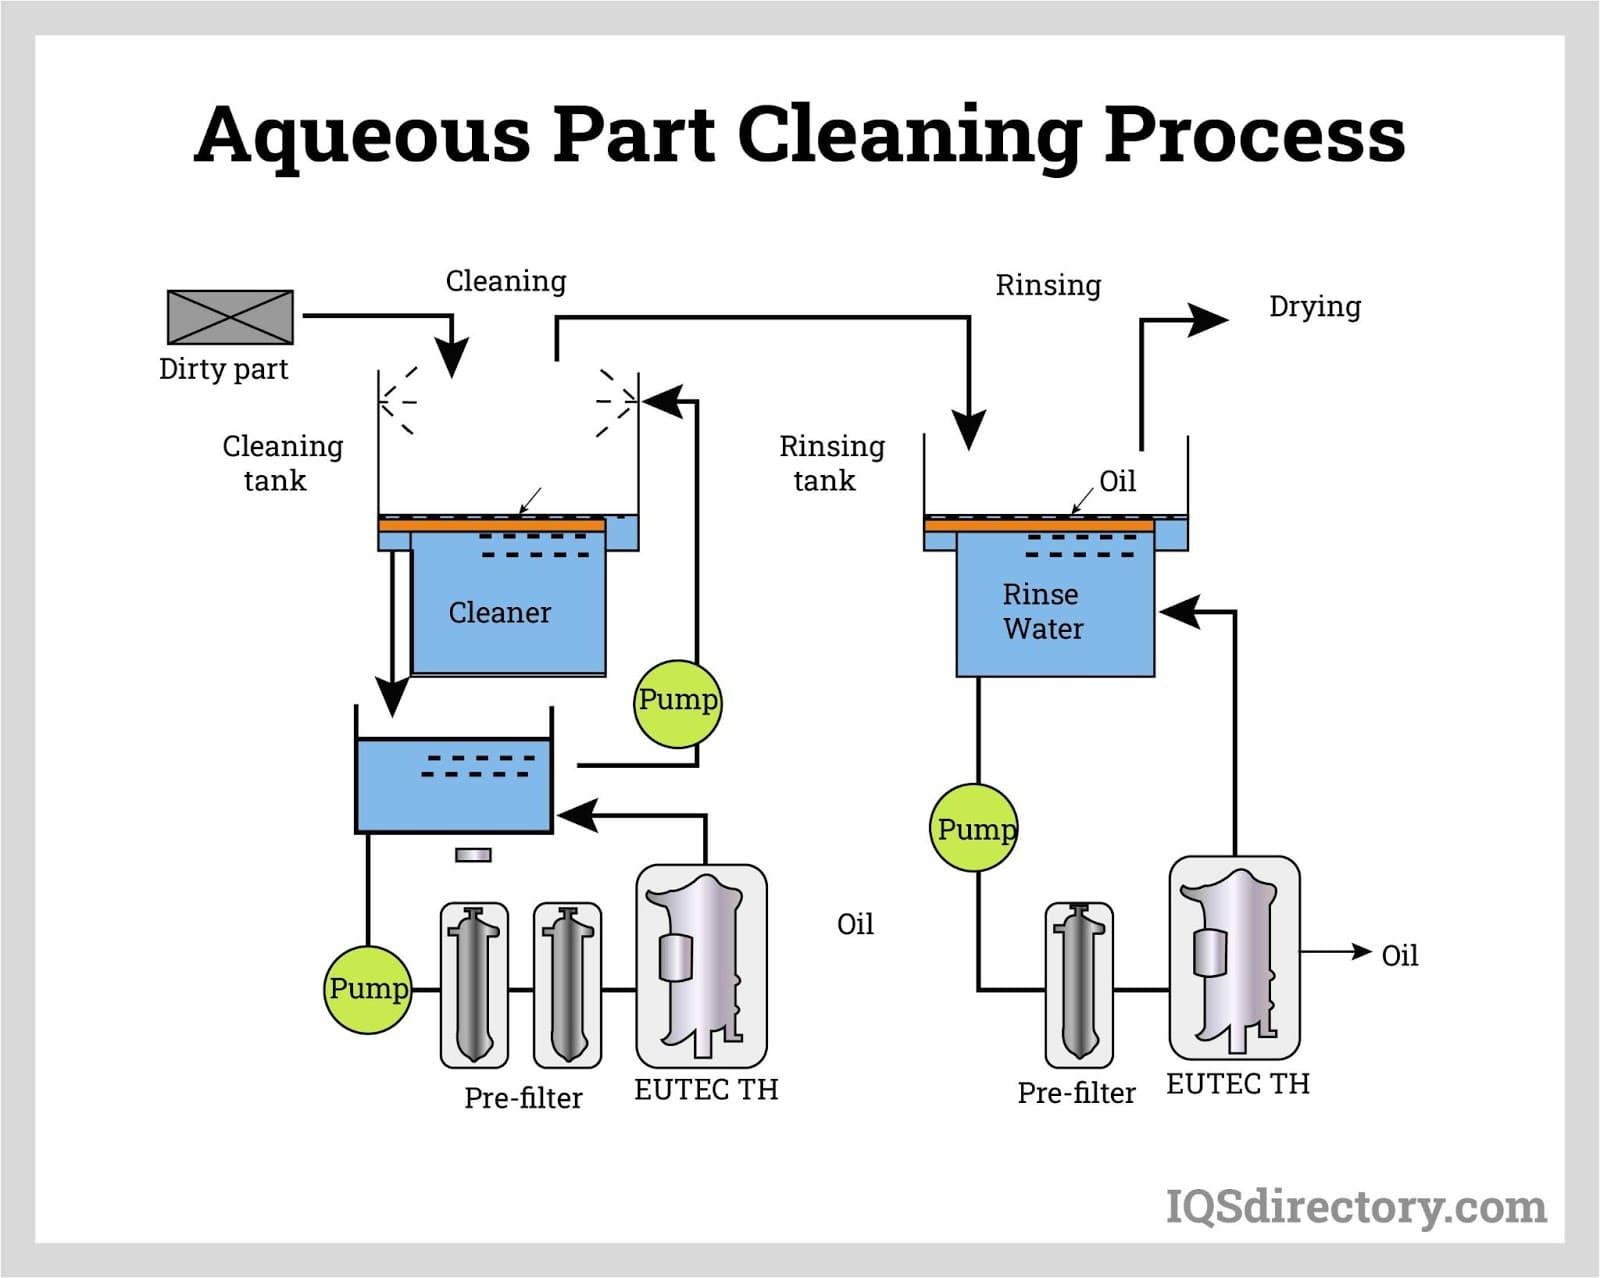 Aqueous Part Cleaning Process